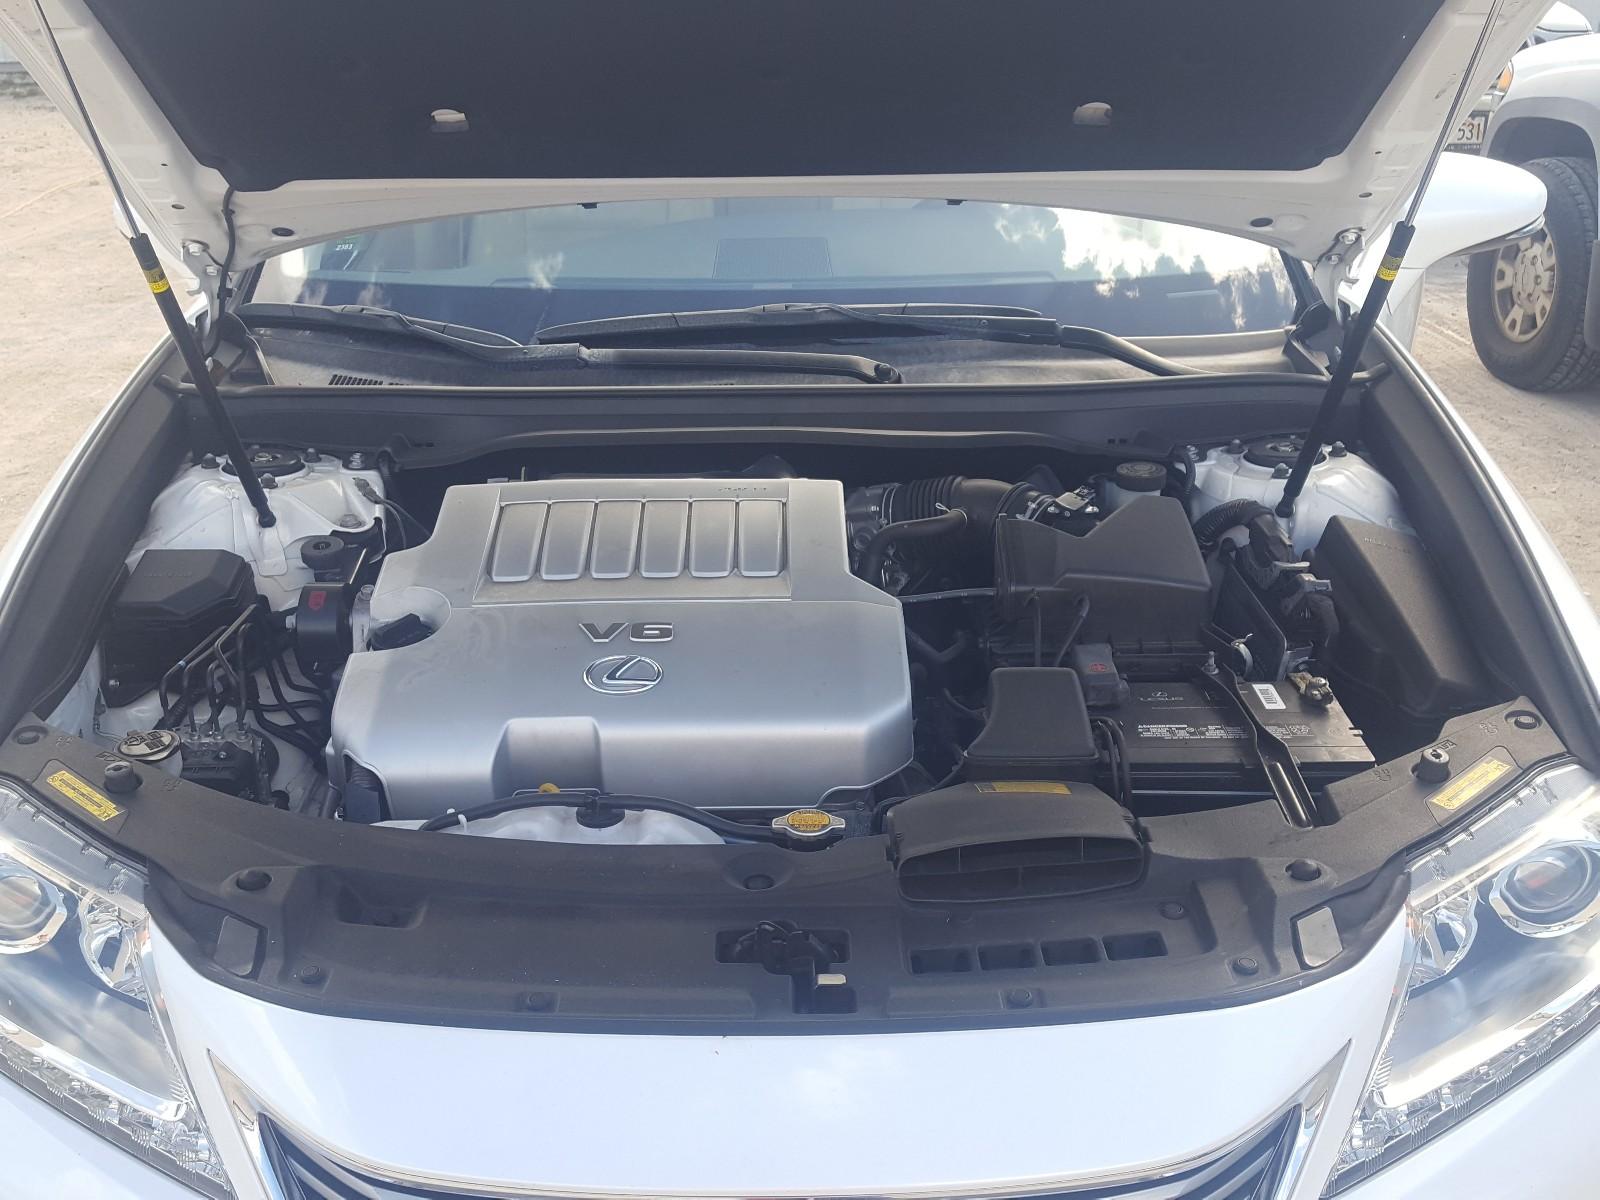 JTHBK1GGXD2082579 - 2013 Lexus Es 350 3.5L inside view